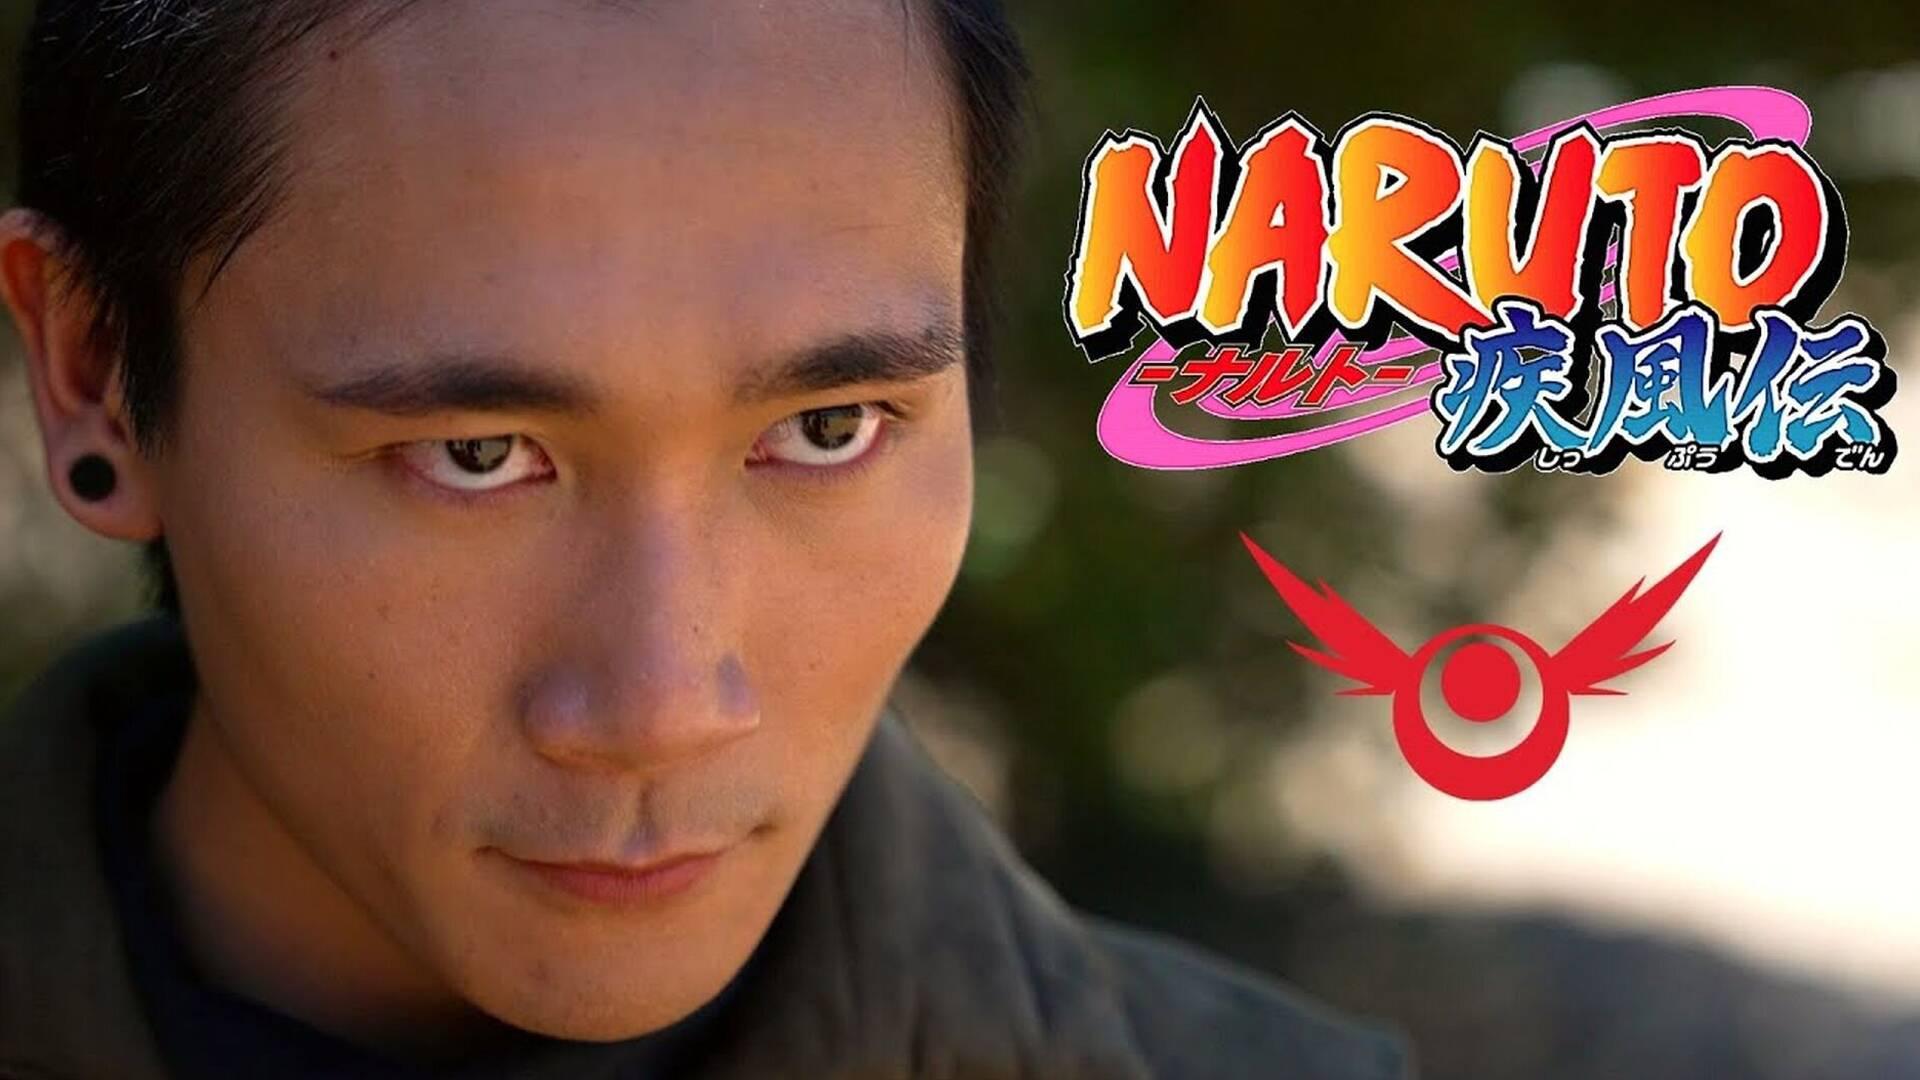 Naruto: Shikamaru's Revenge